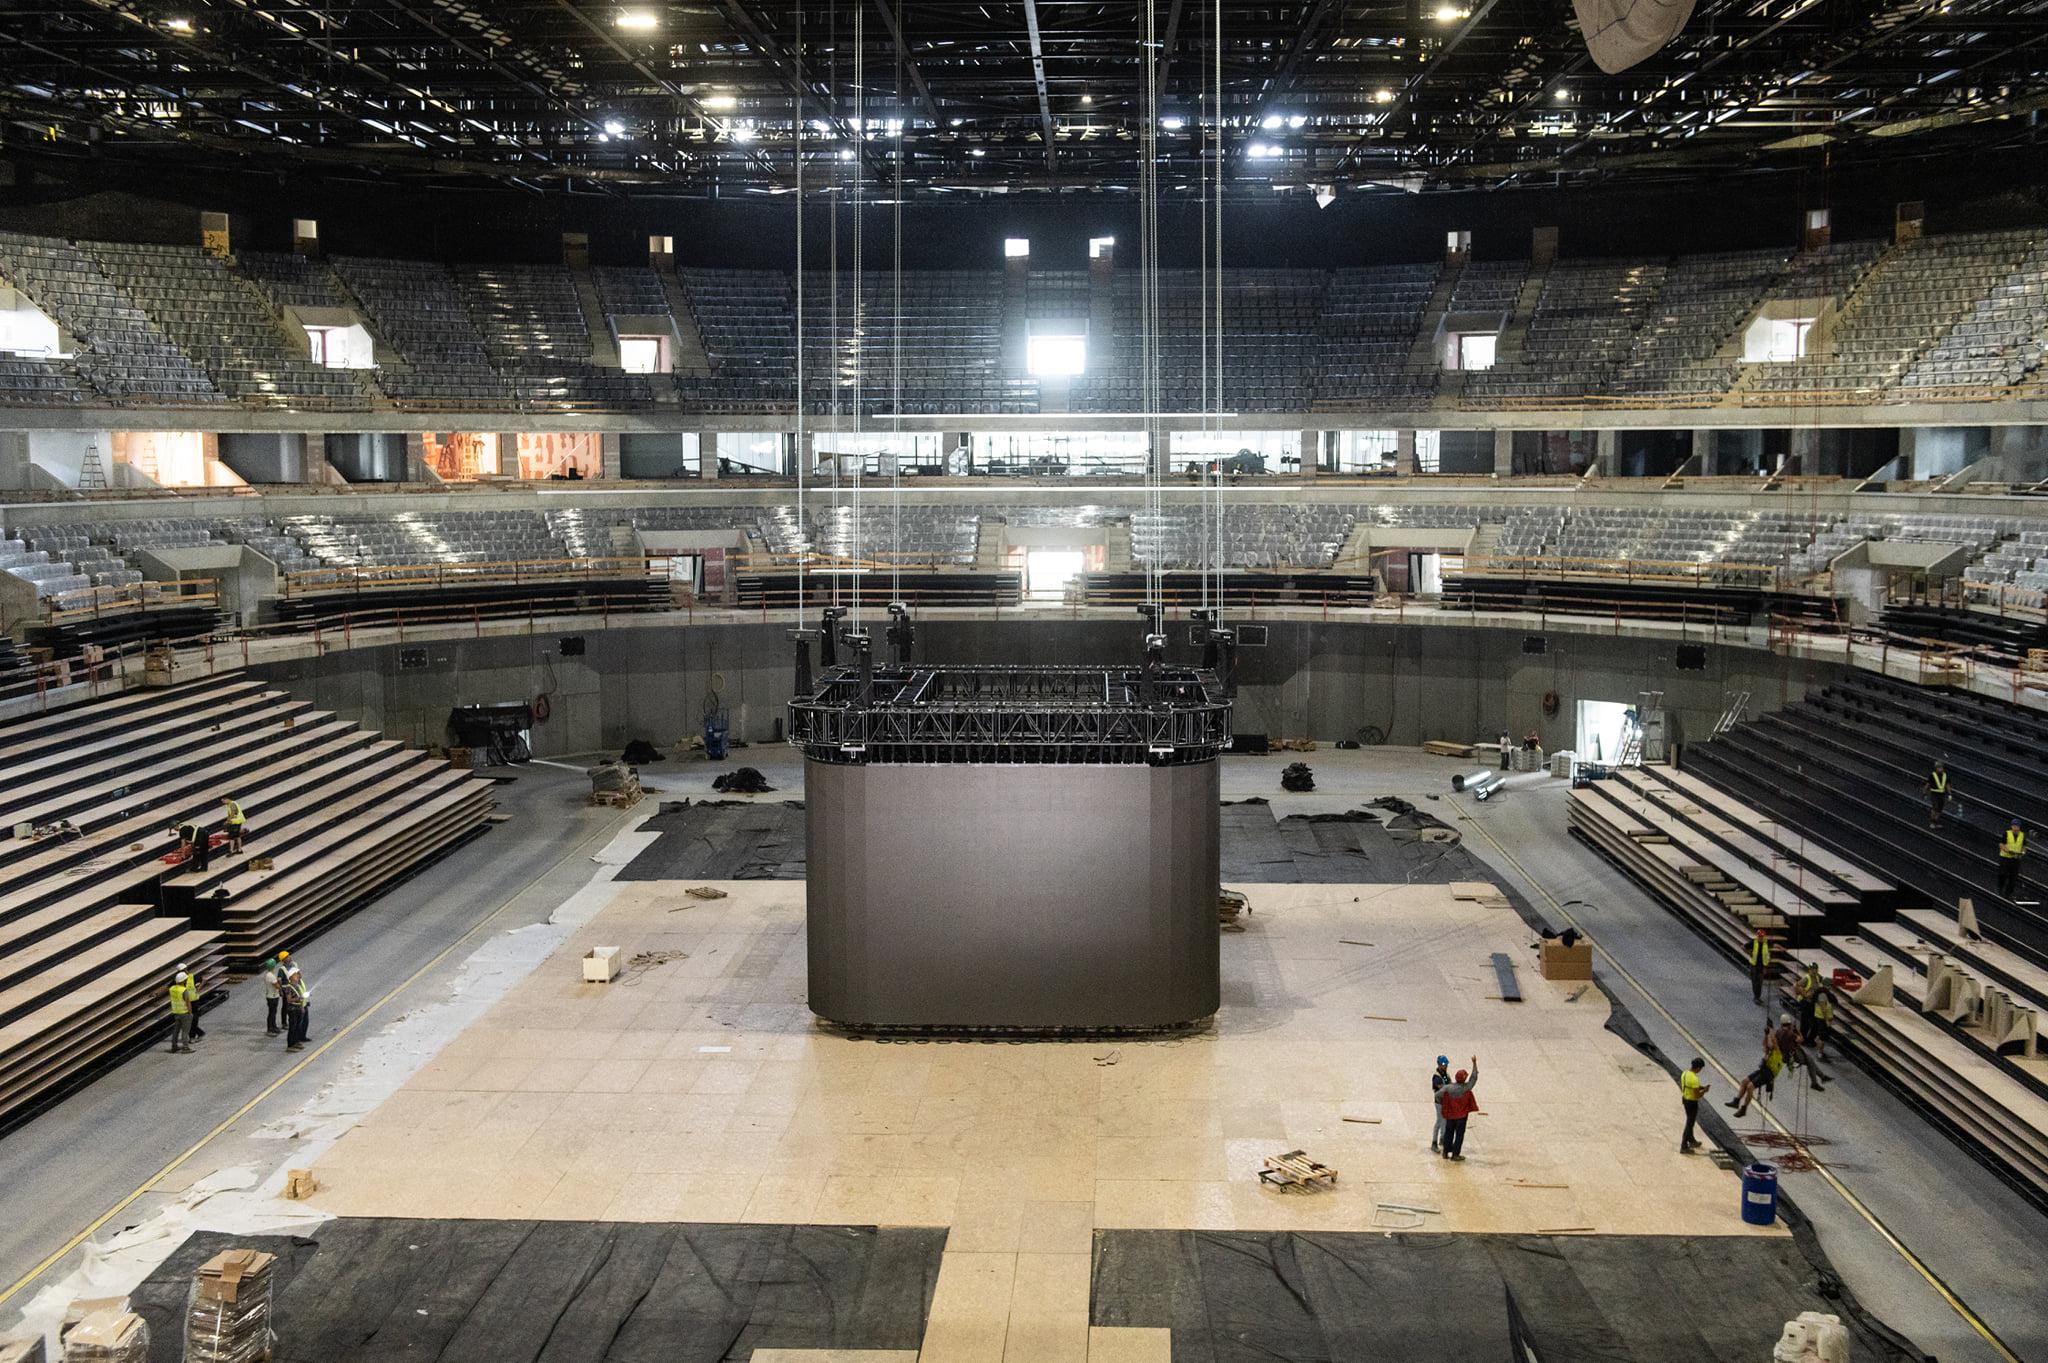 handball stadium budapest Interior building 1